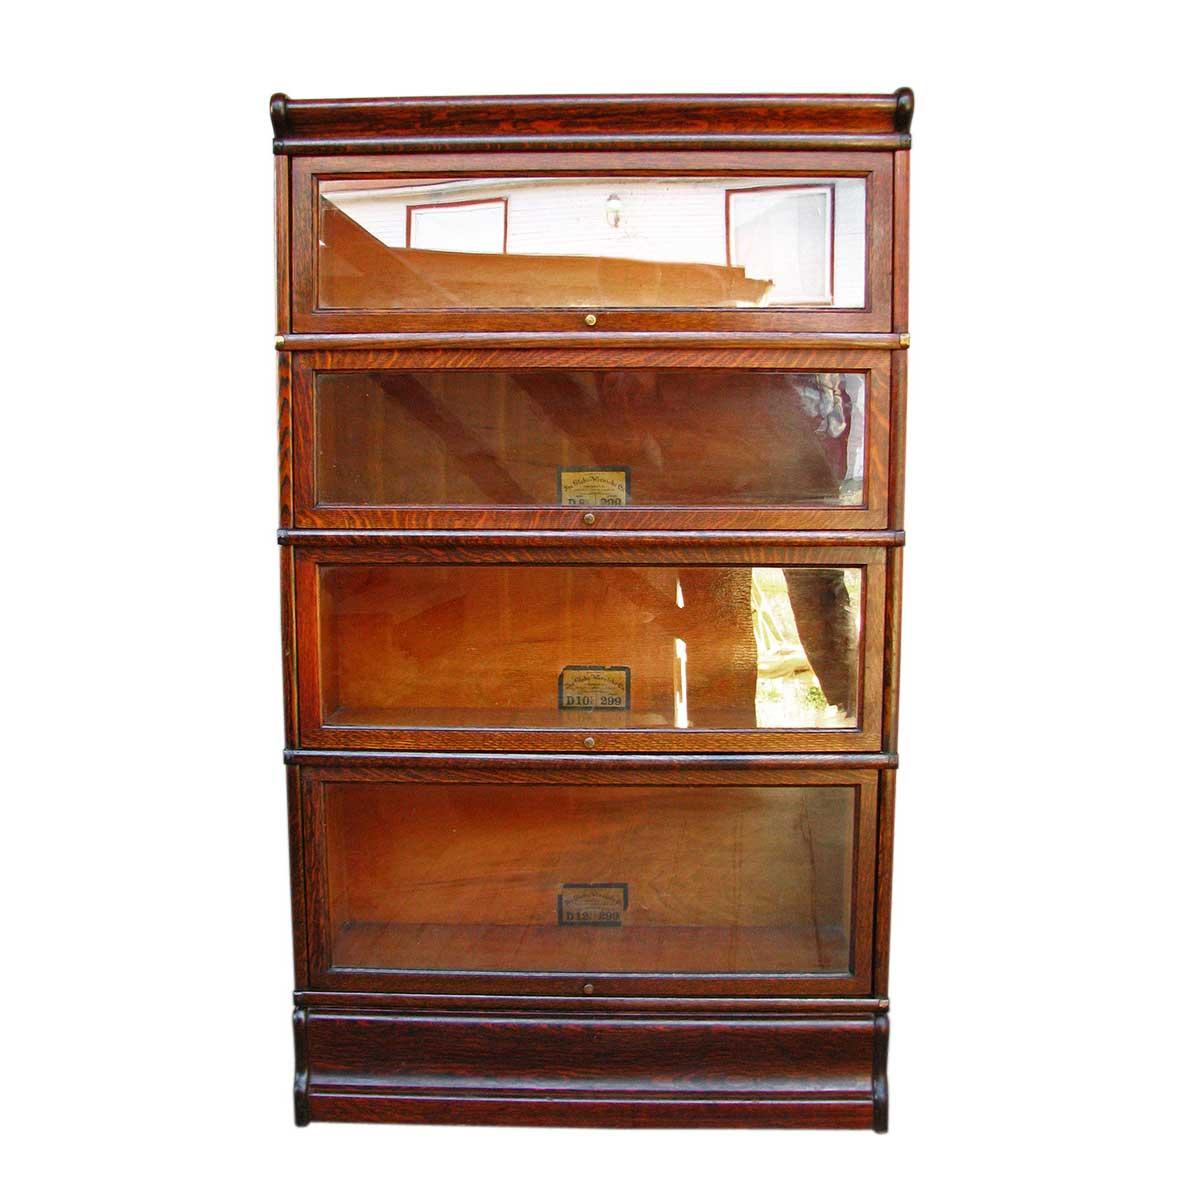 Oak Barrister Bookcase to Organize Your Books